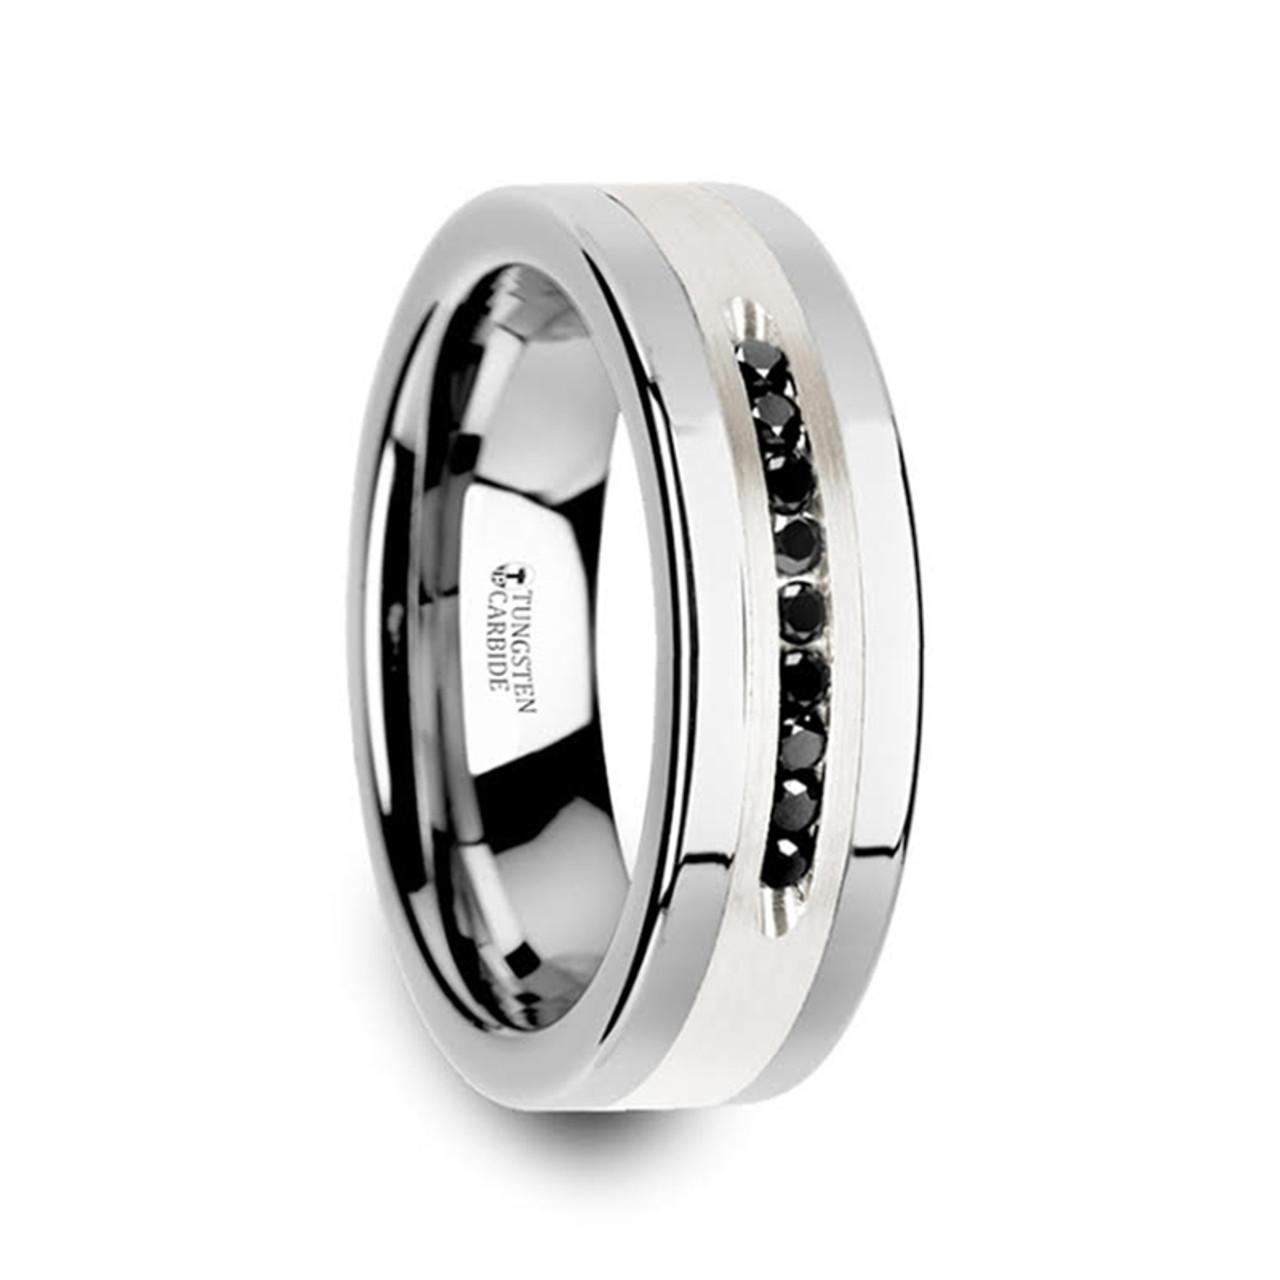 Triton U127BC Black Tunsten 8mm Male Wedding Band at MWB